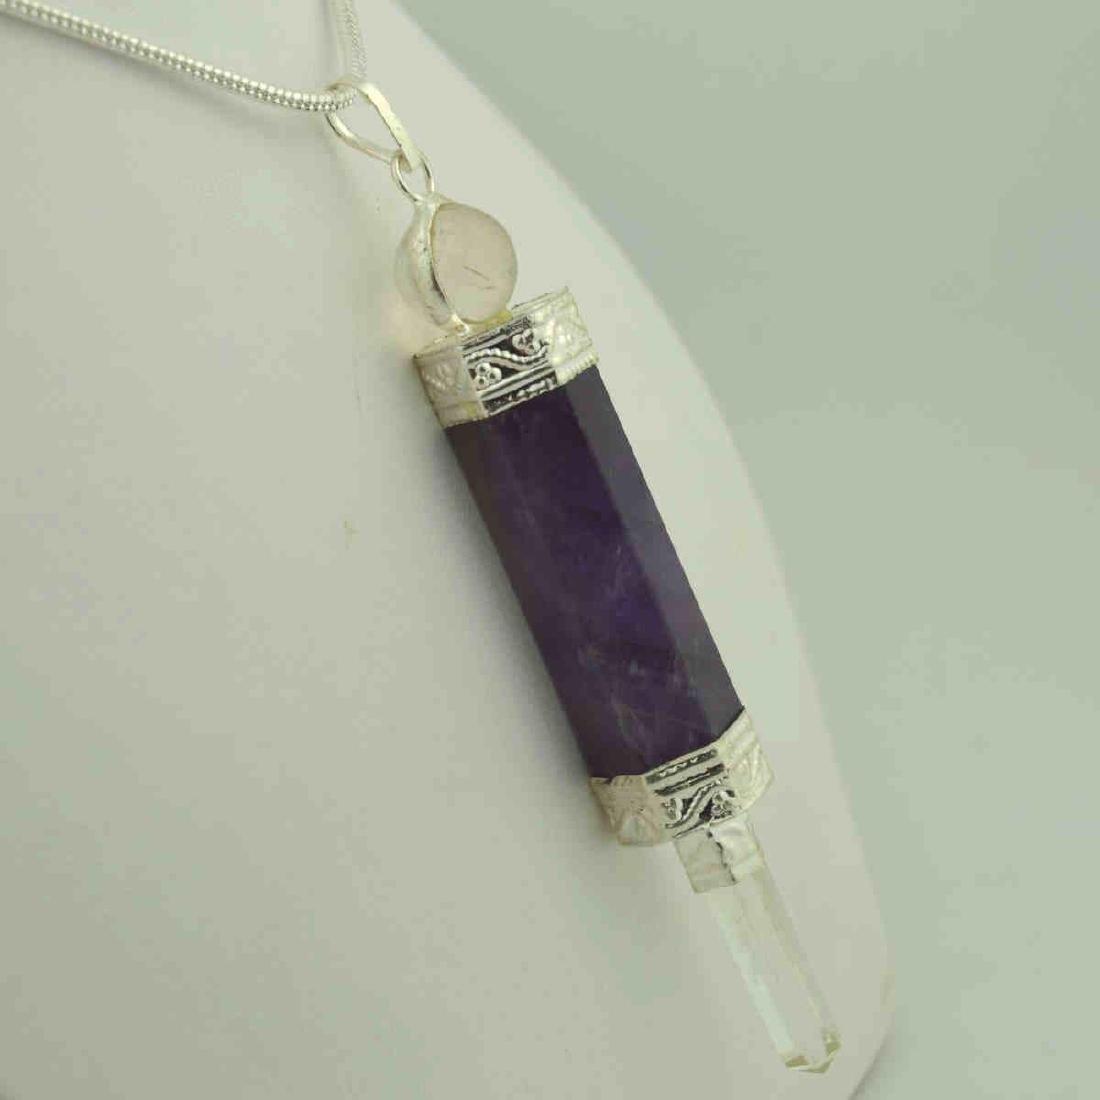 Amethyst crystal pendant necklace - 2